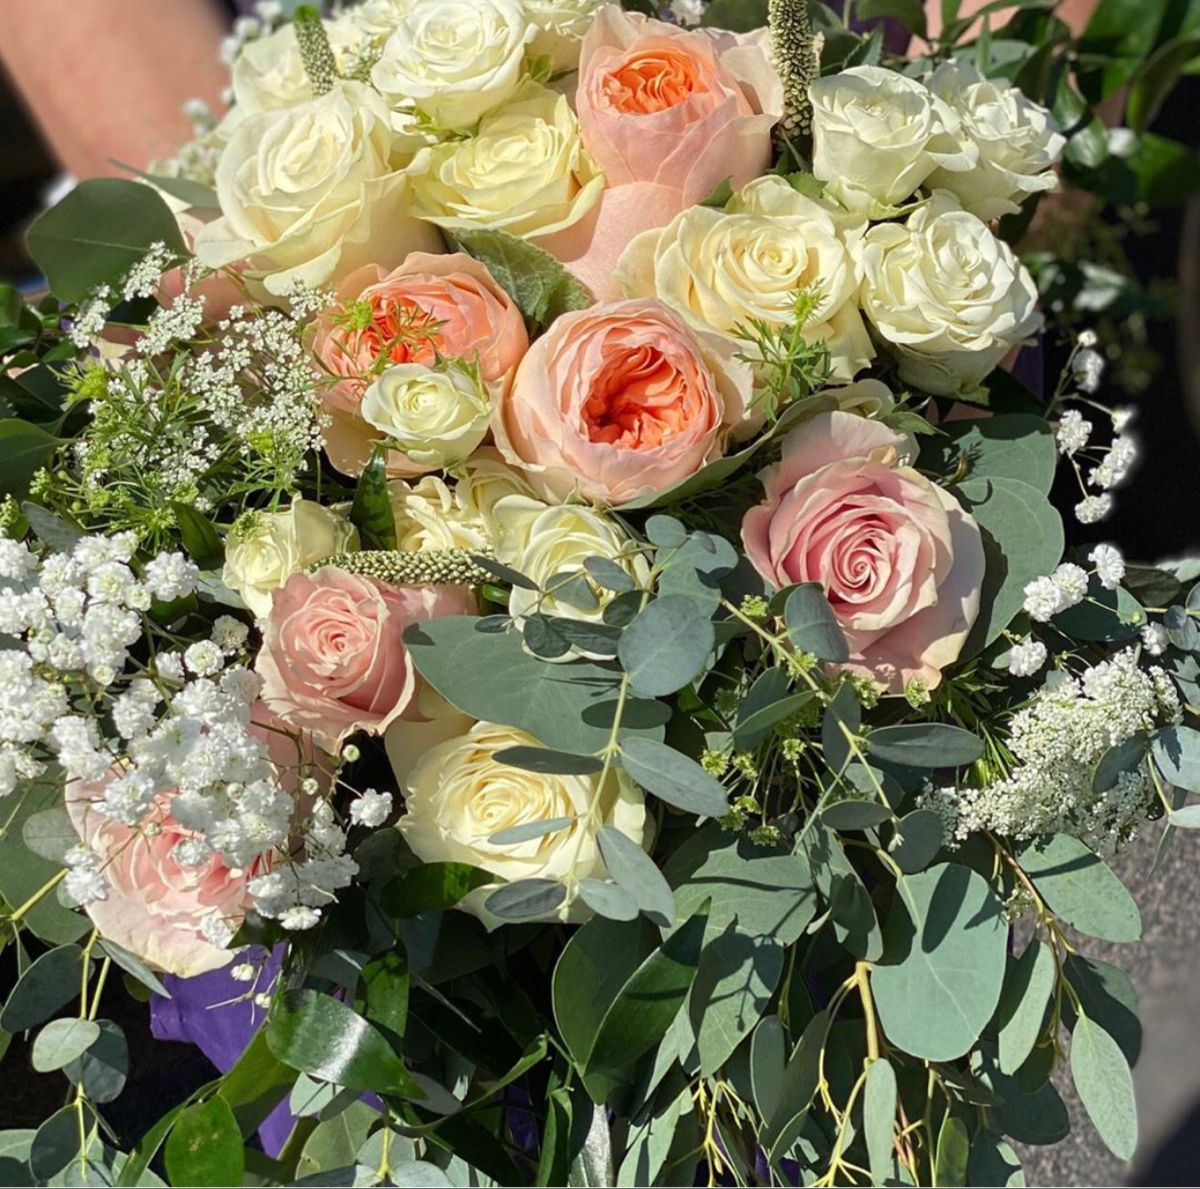 Wedding Bouquets In 2020 Fall Wedding Flowers Bridal Bouquet Wedding Bouquets